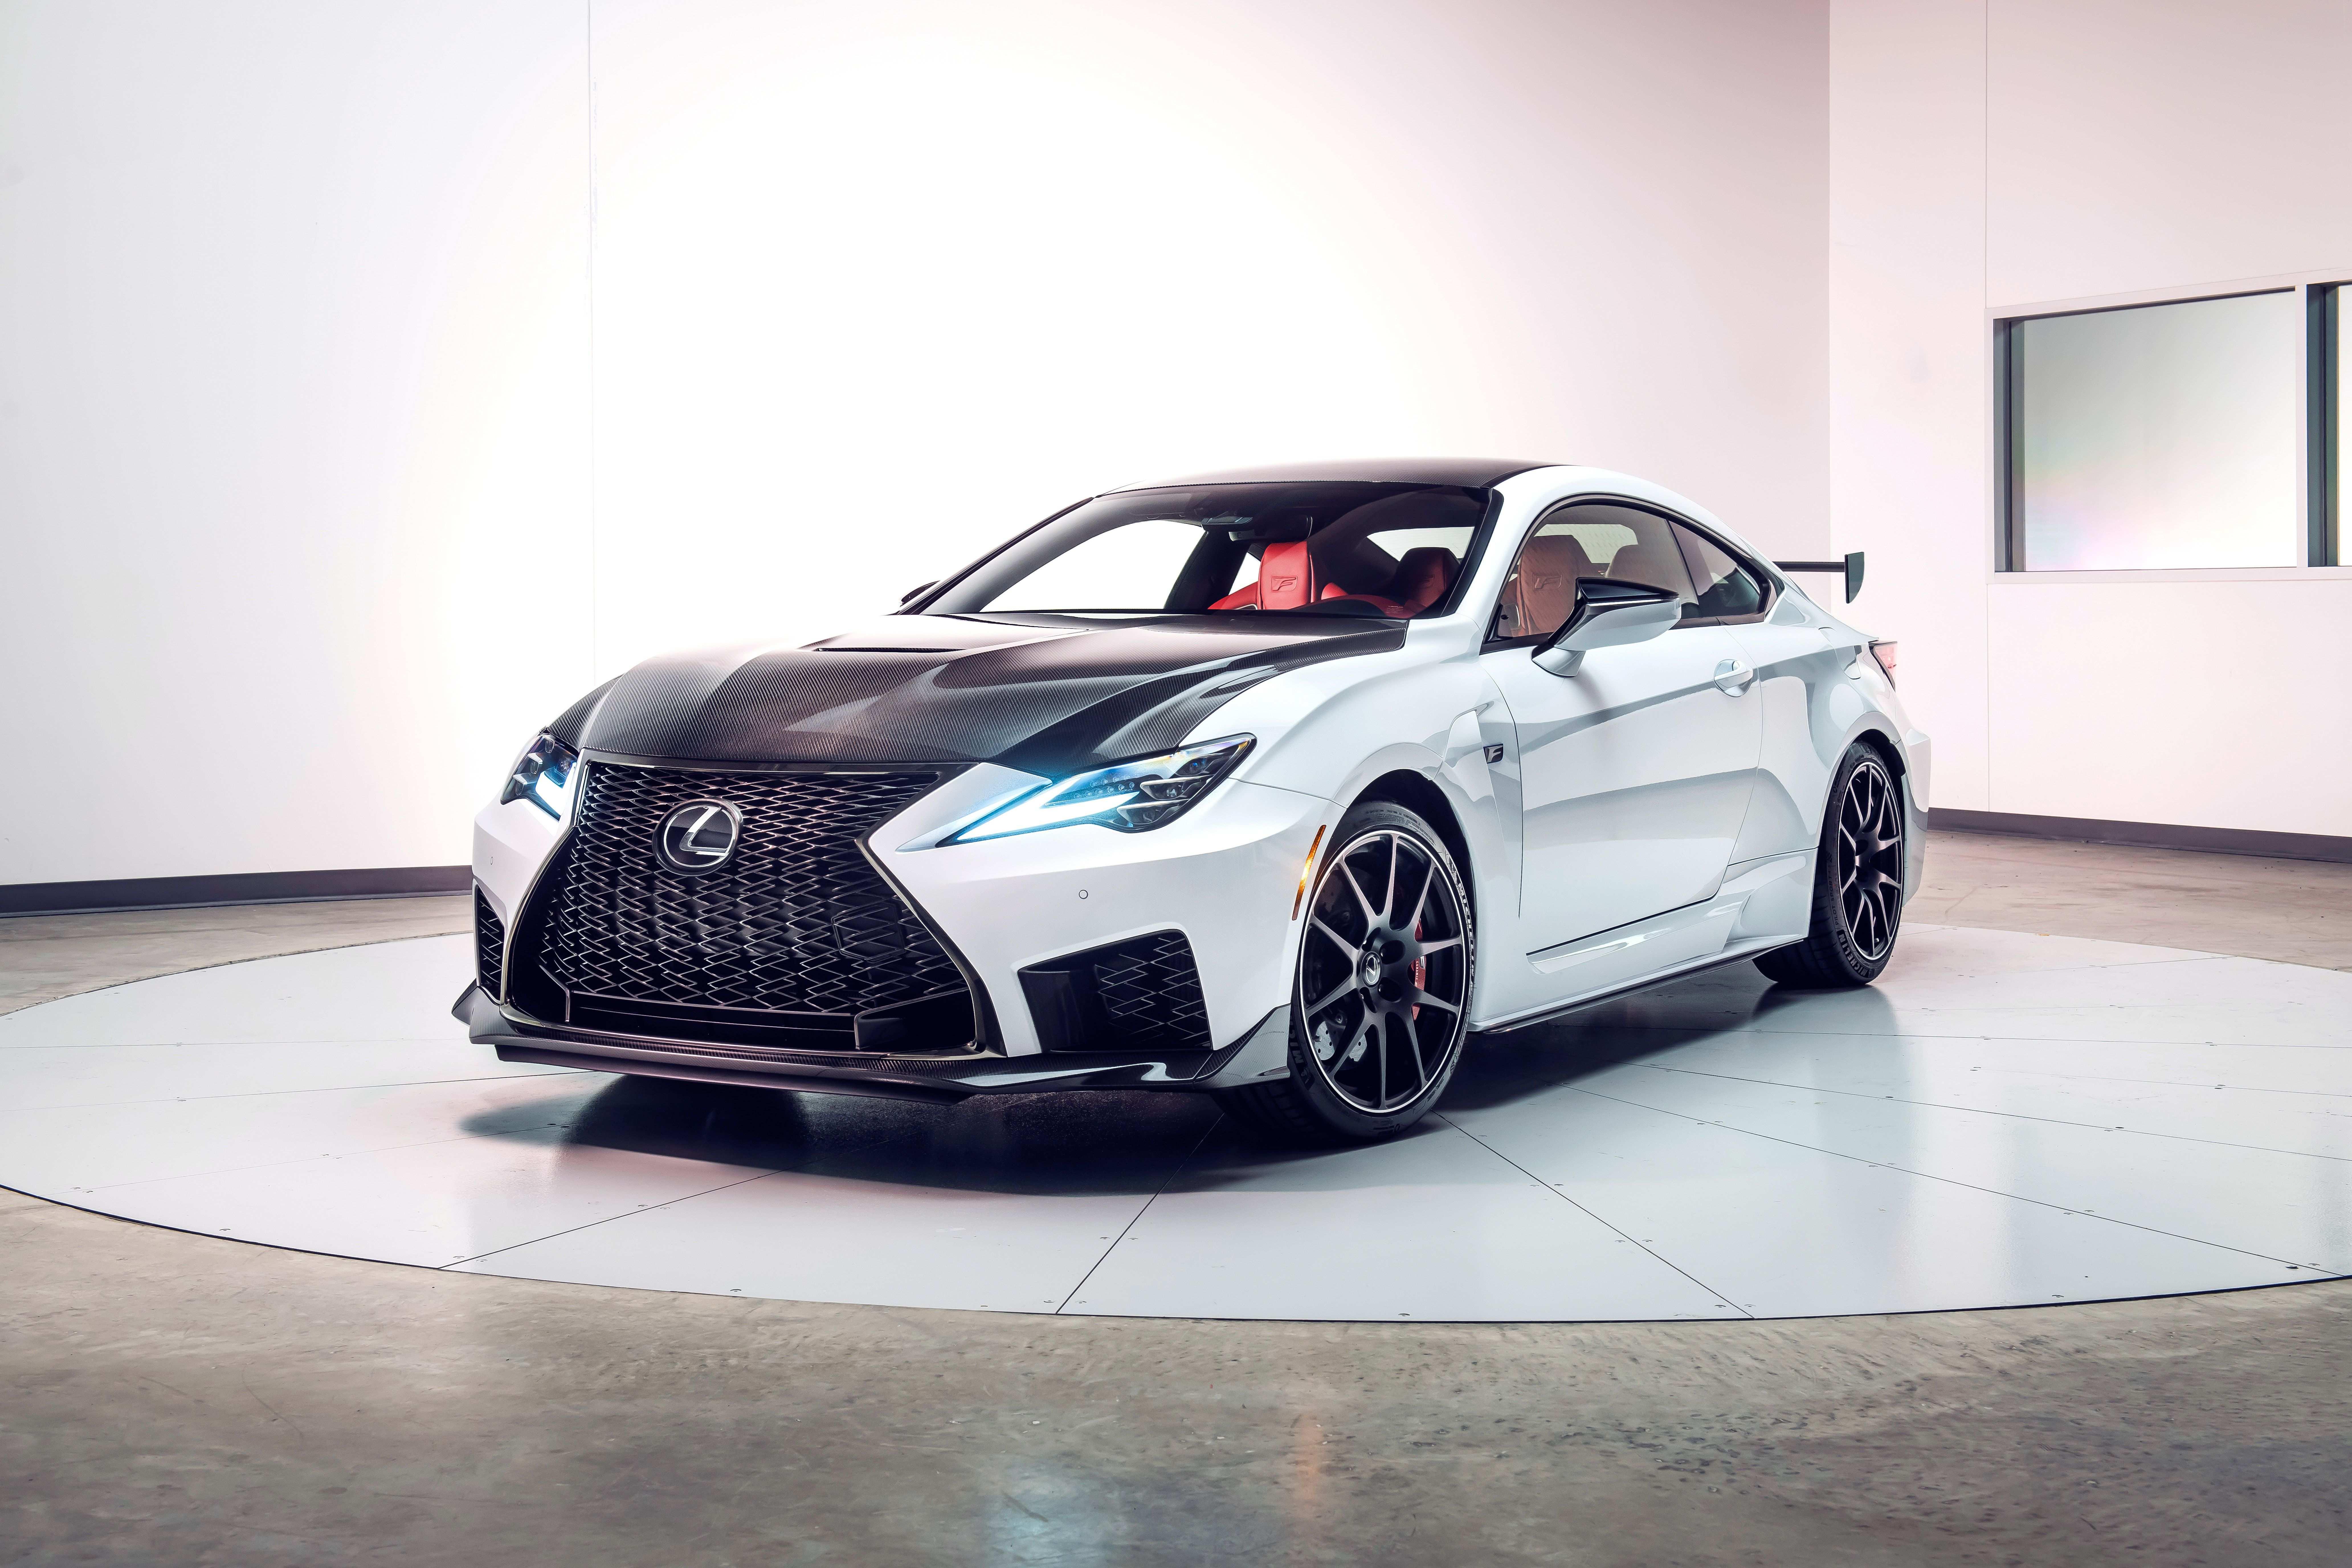 19 Best Review Lexus 2020 Sport Spesification with Lexus 2020 Sport